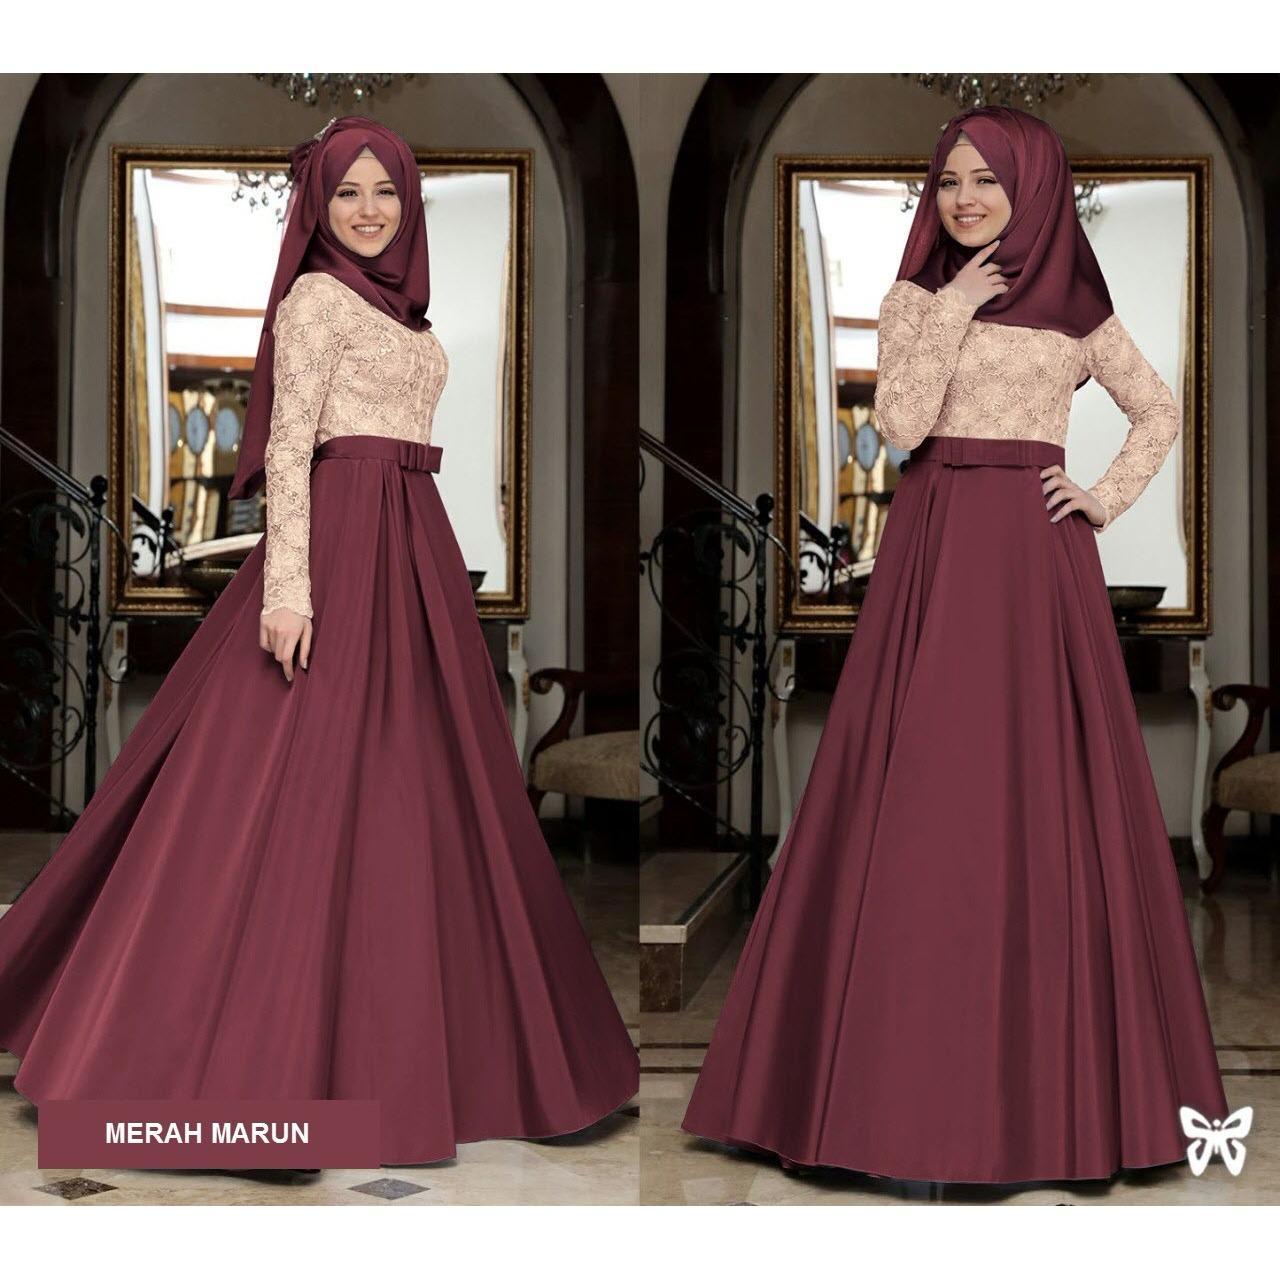 Ritsleting belakang Flavia Store Maxi Dress Lengan Panjang Set 2 in 1 FS0767 - MERAH MARUN / Gamis